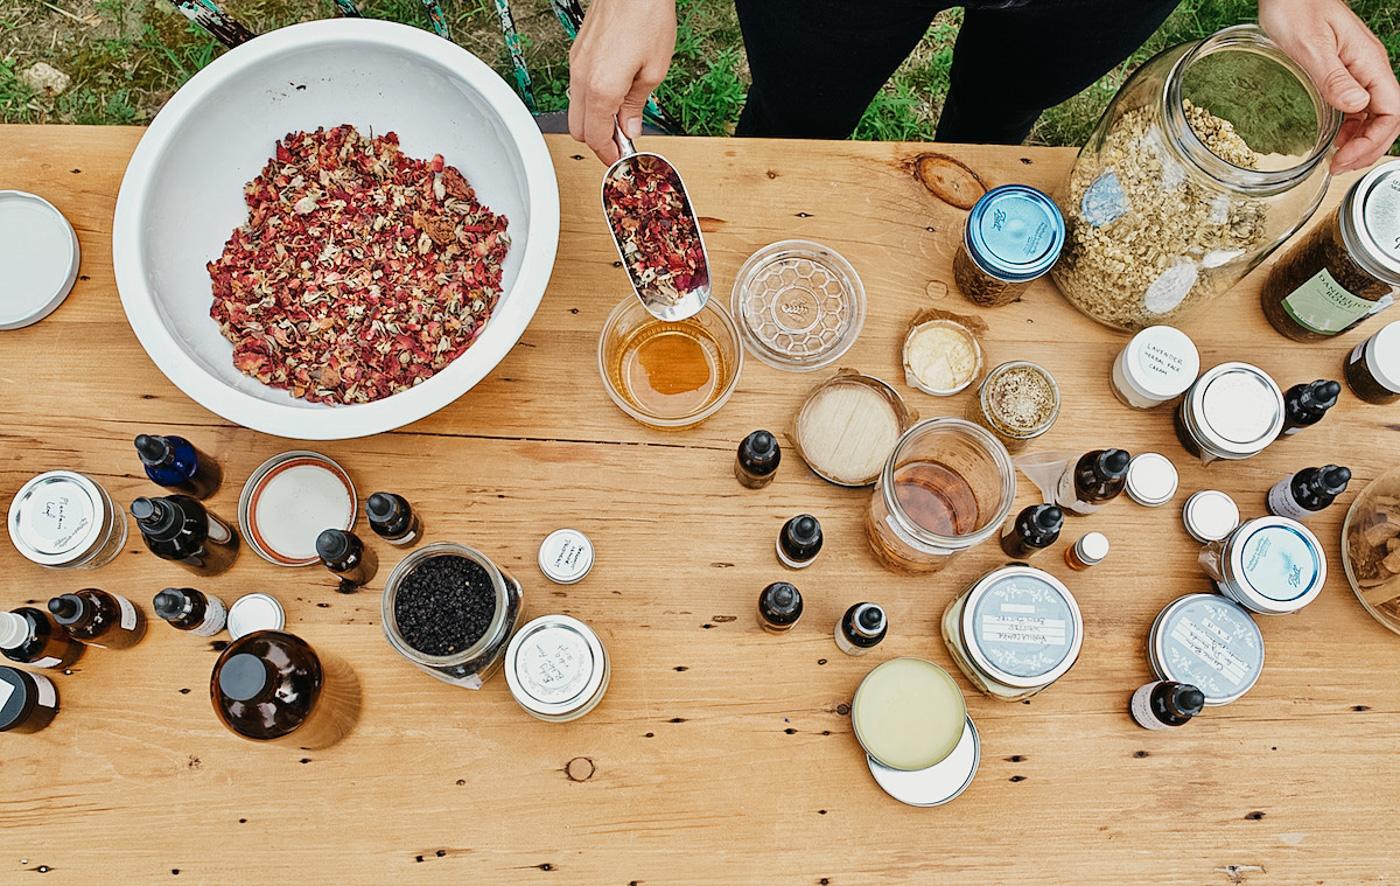 Making Herbal Preparations 101 Mini Course - Tabletop herbs